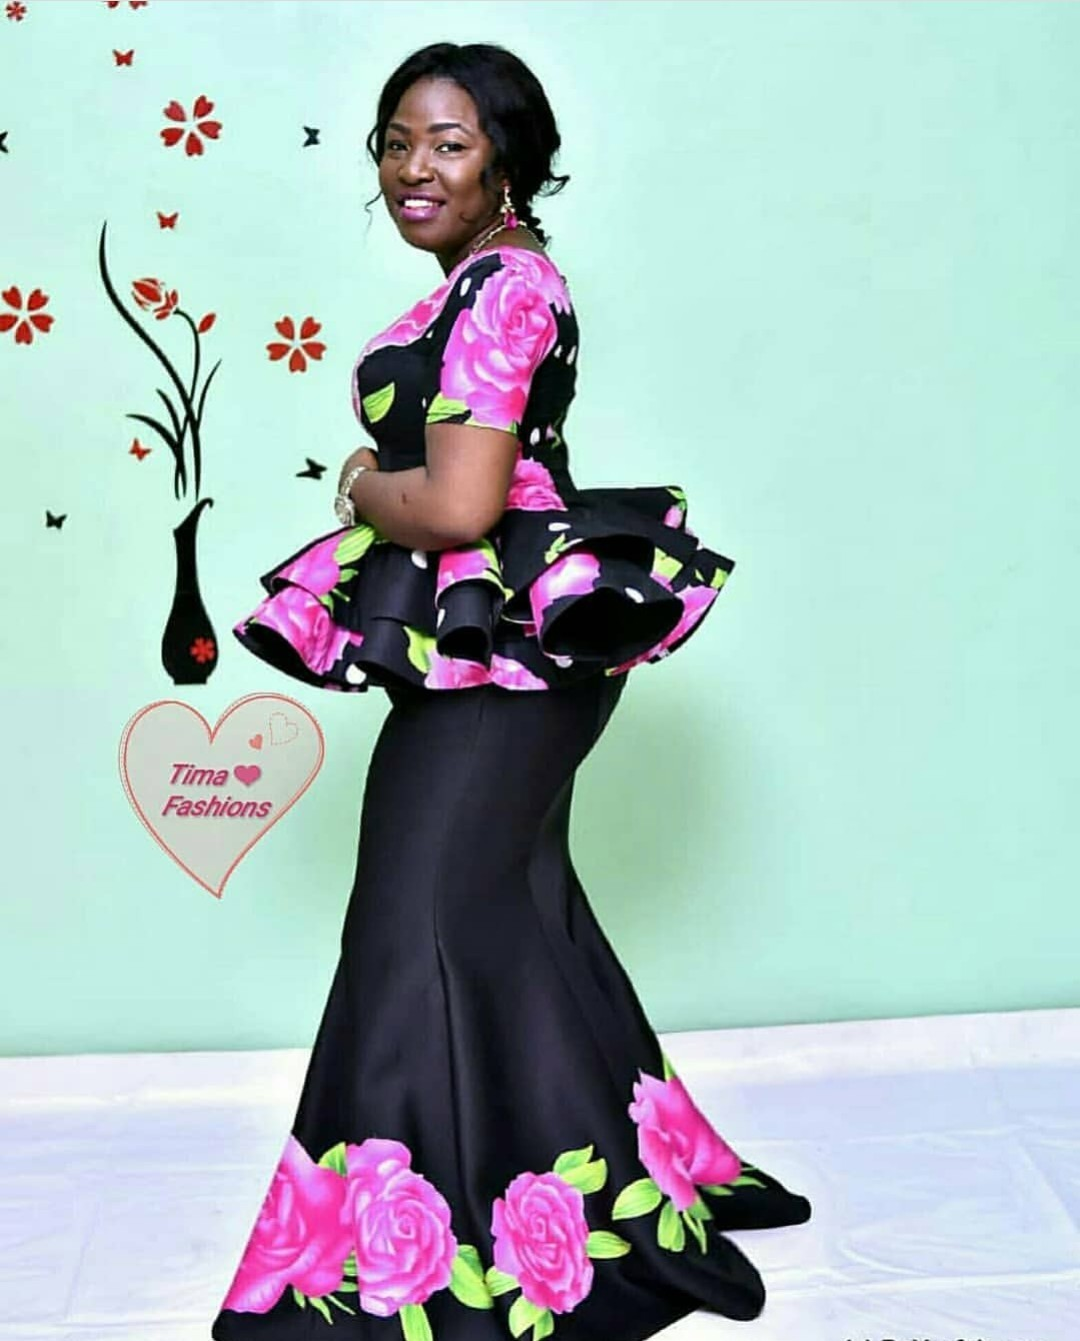 Floral Scuba/Noeprene Fabric Styles